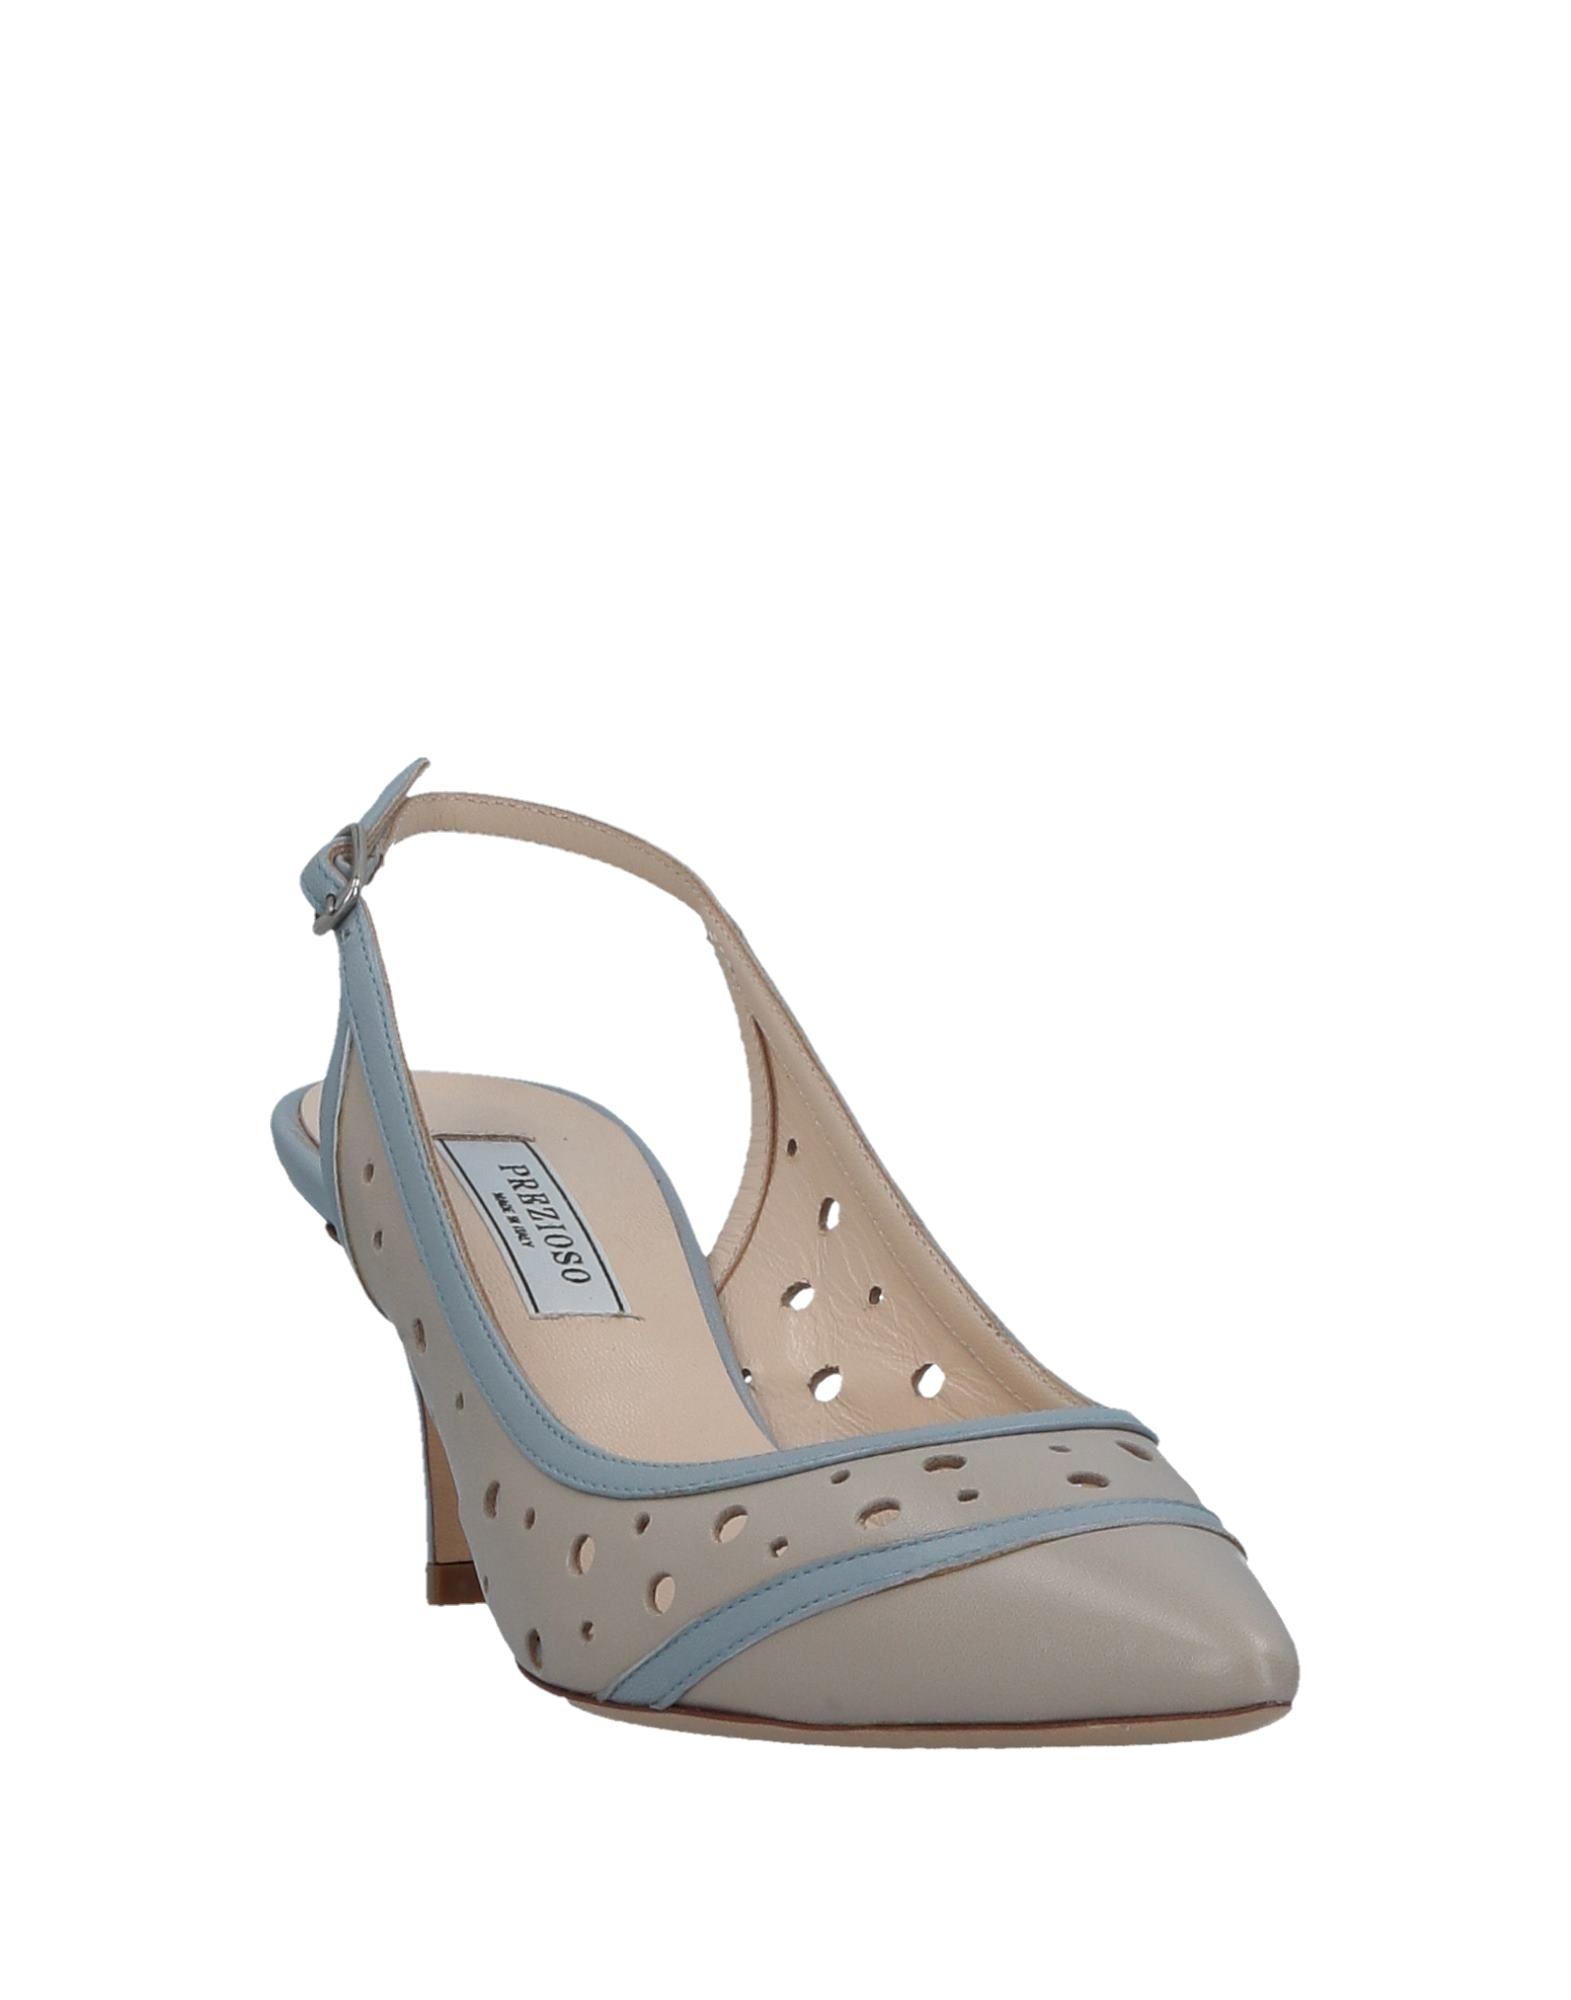 ... Prezioso Pumps Gute Damen 11525033LT Gute Pumps Qualität beliebte  Schuhe 6e71d1 ... 10a38dfbc8